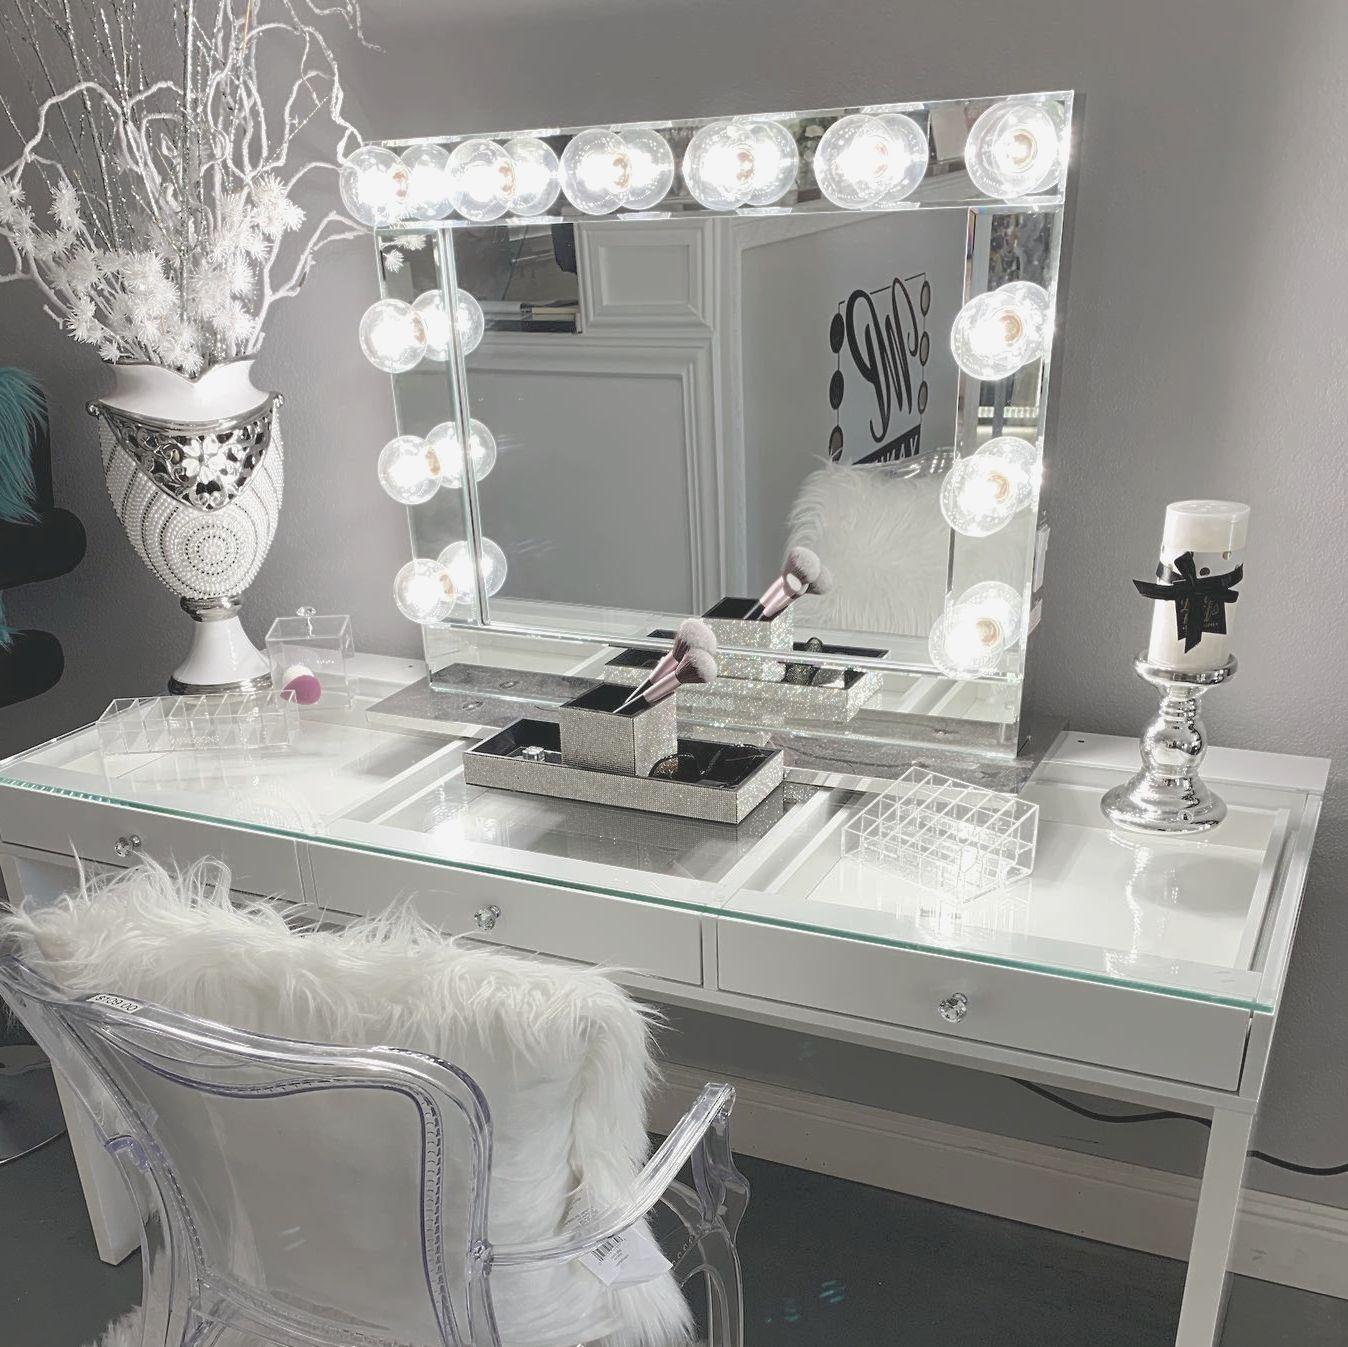 Hollywood Reflection Plus Vanity Mirror Impressions Vanity Co Makeup Vanity Mirror With Lights Hollywood Vanity Mirror Impressions Vanity